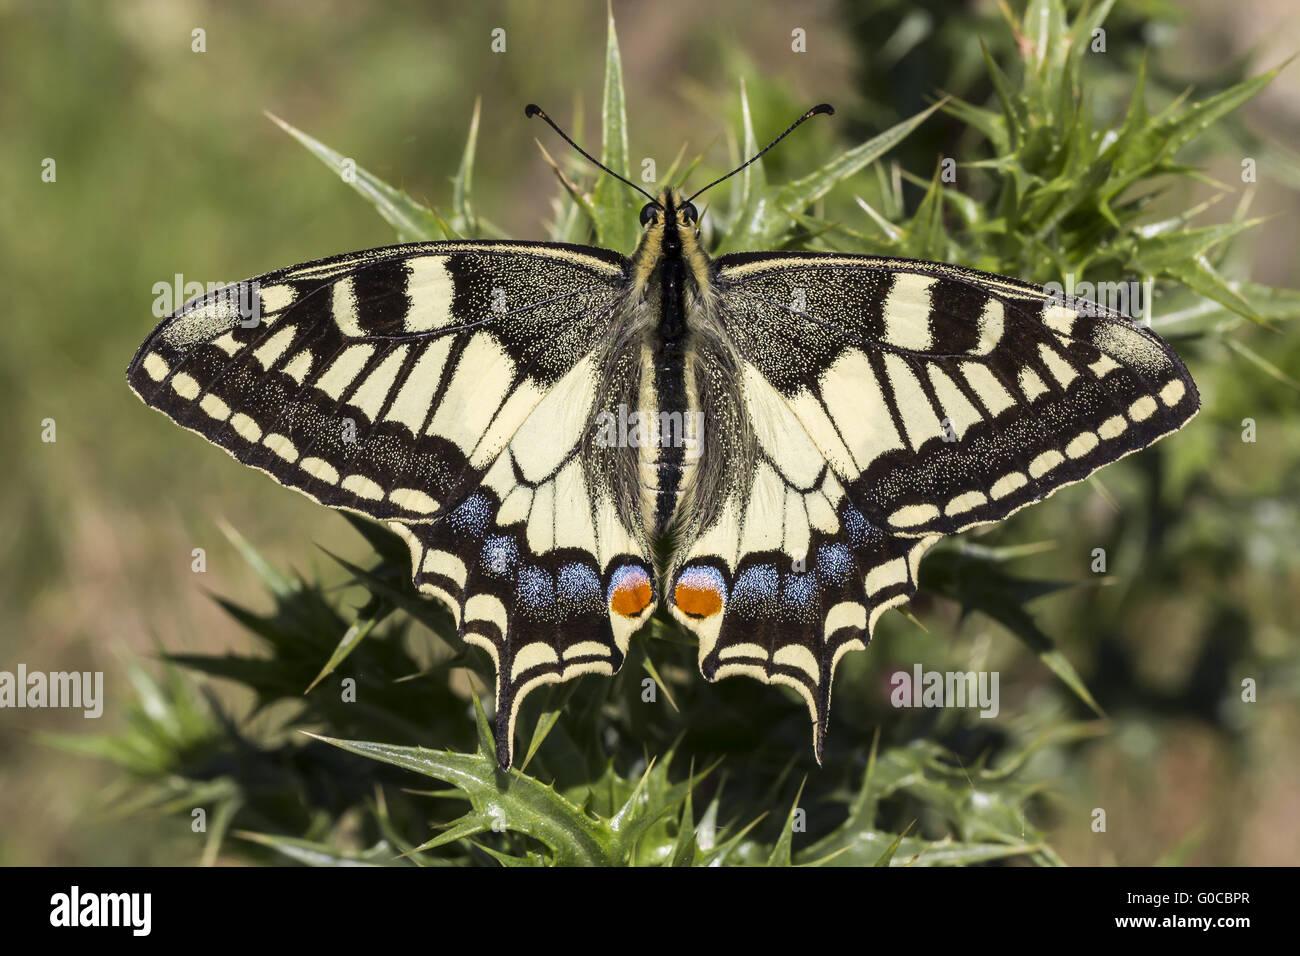 Papilio machaon, especie de mariposa de Europa Foto de stock